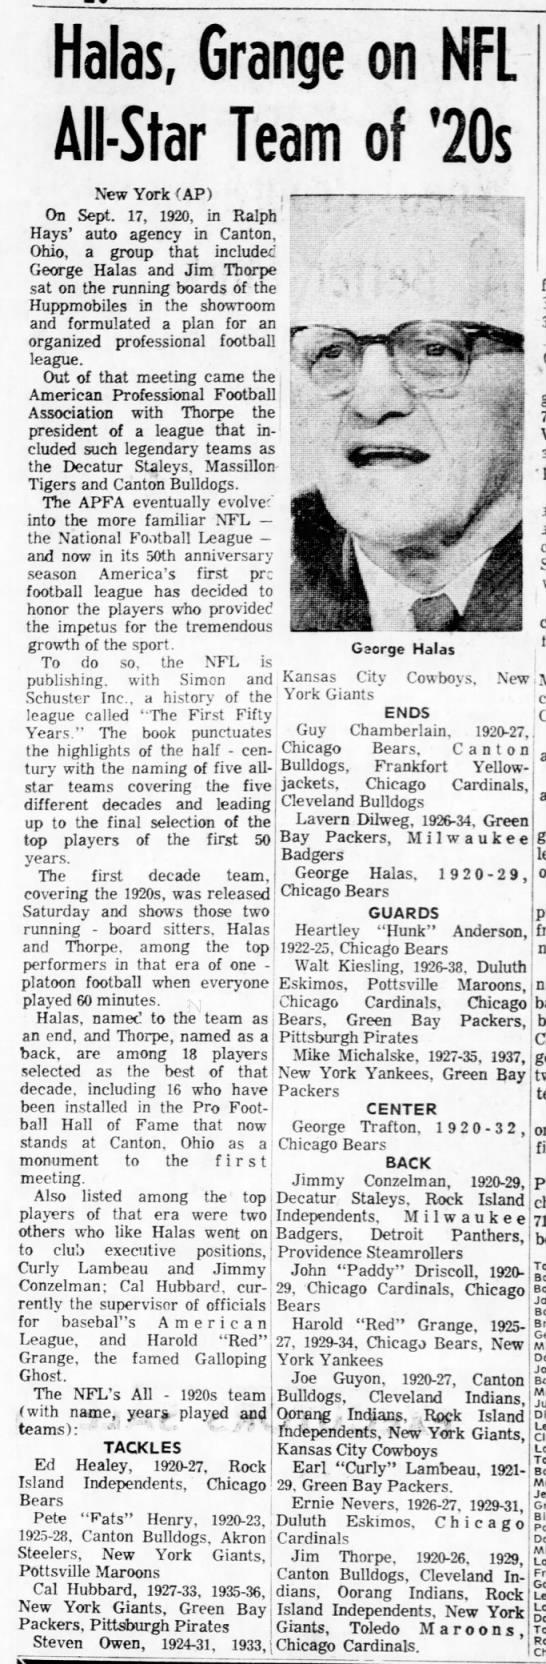 Halas, Grange on NFL All-Star Team of '20s -